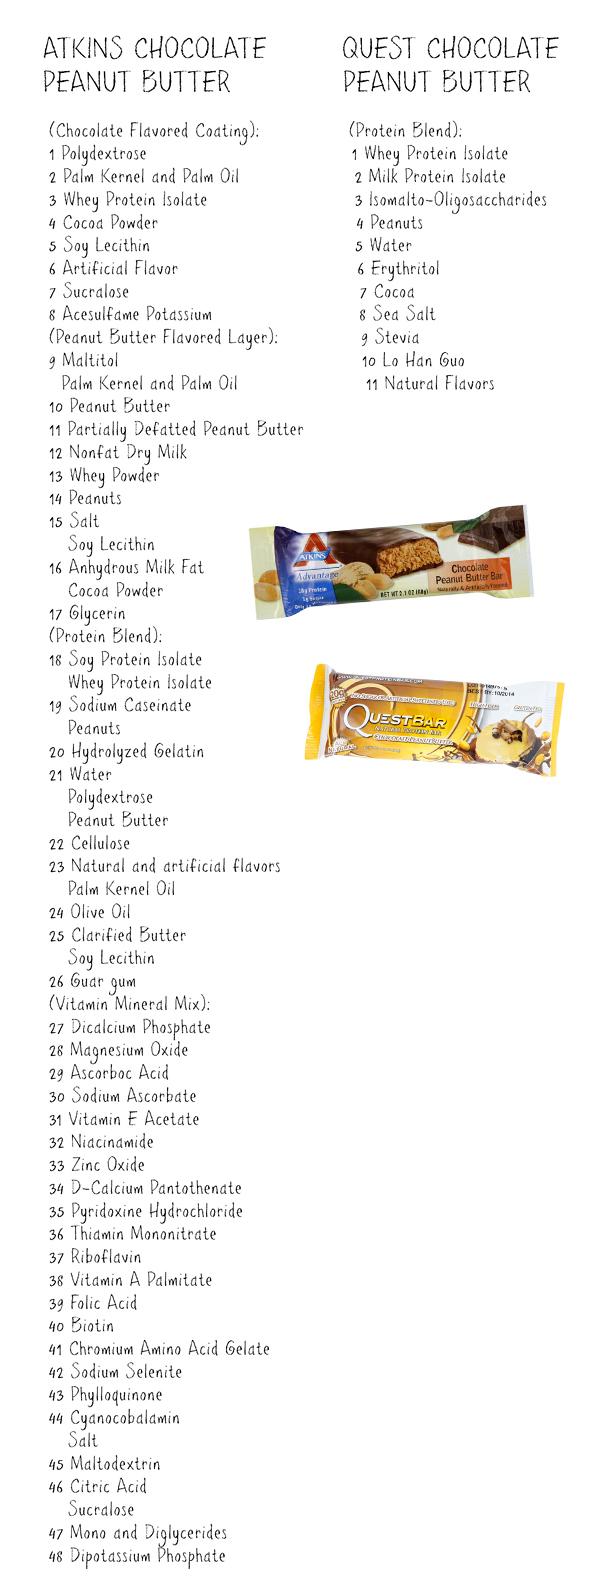 Ingredients_Atkins_vs_Quest